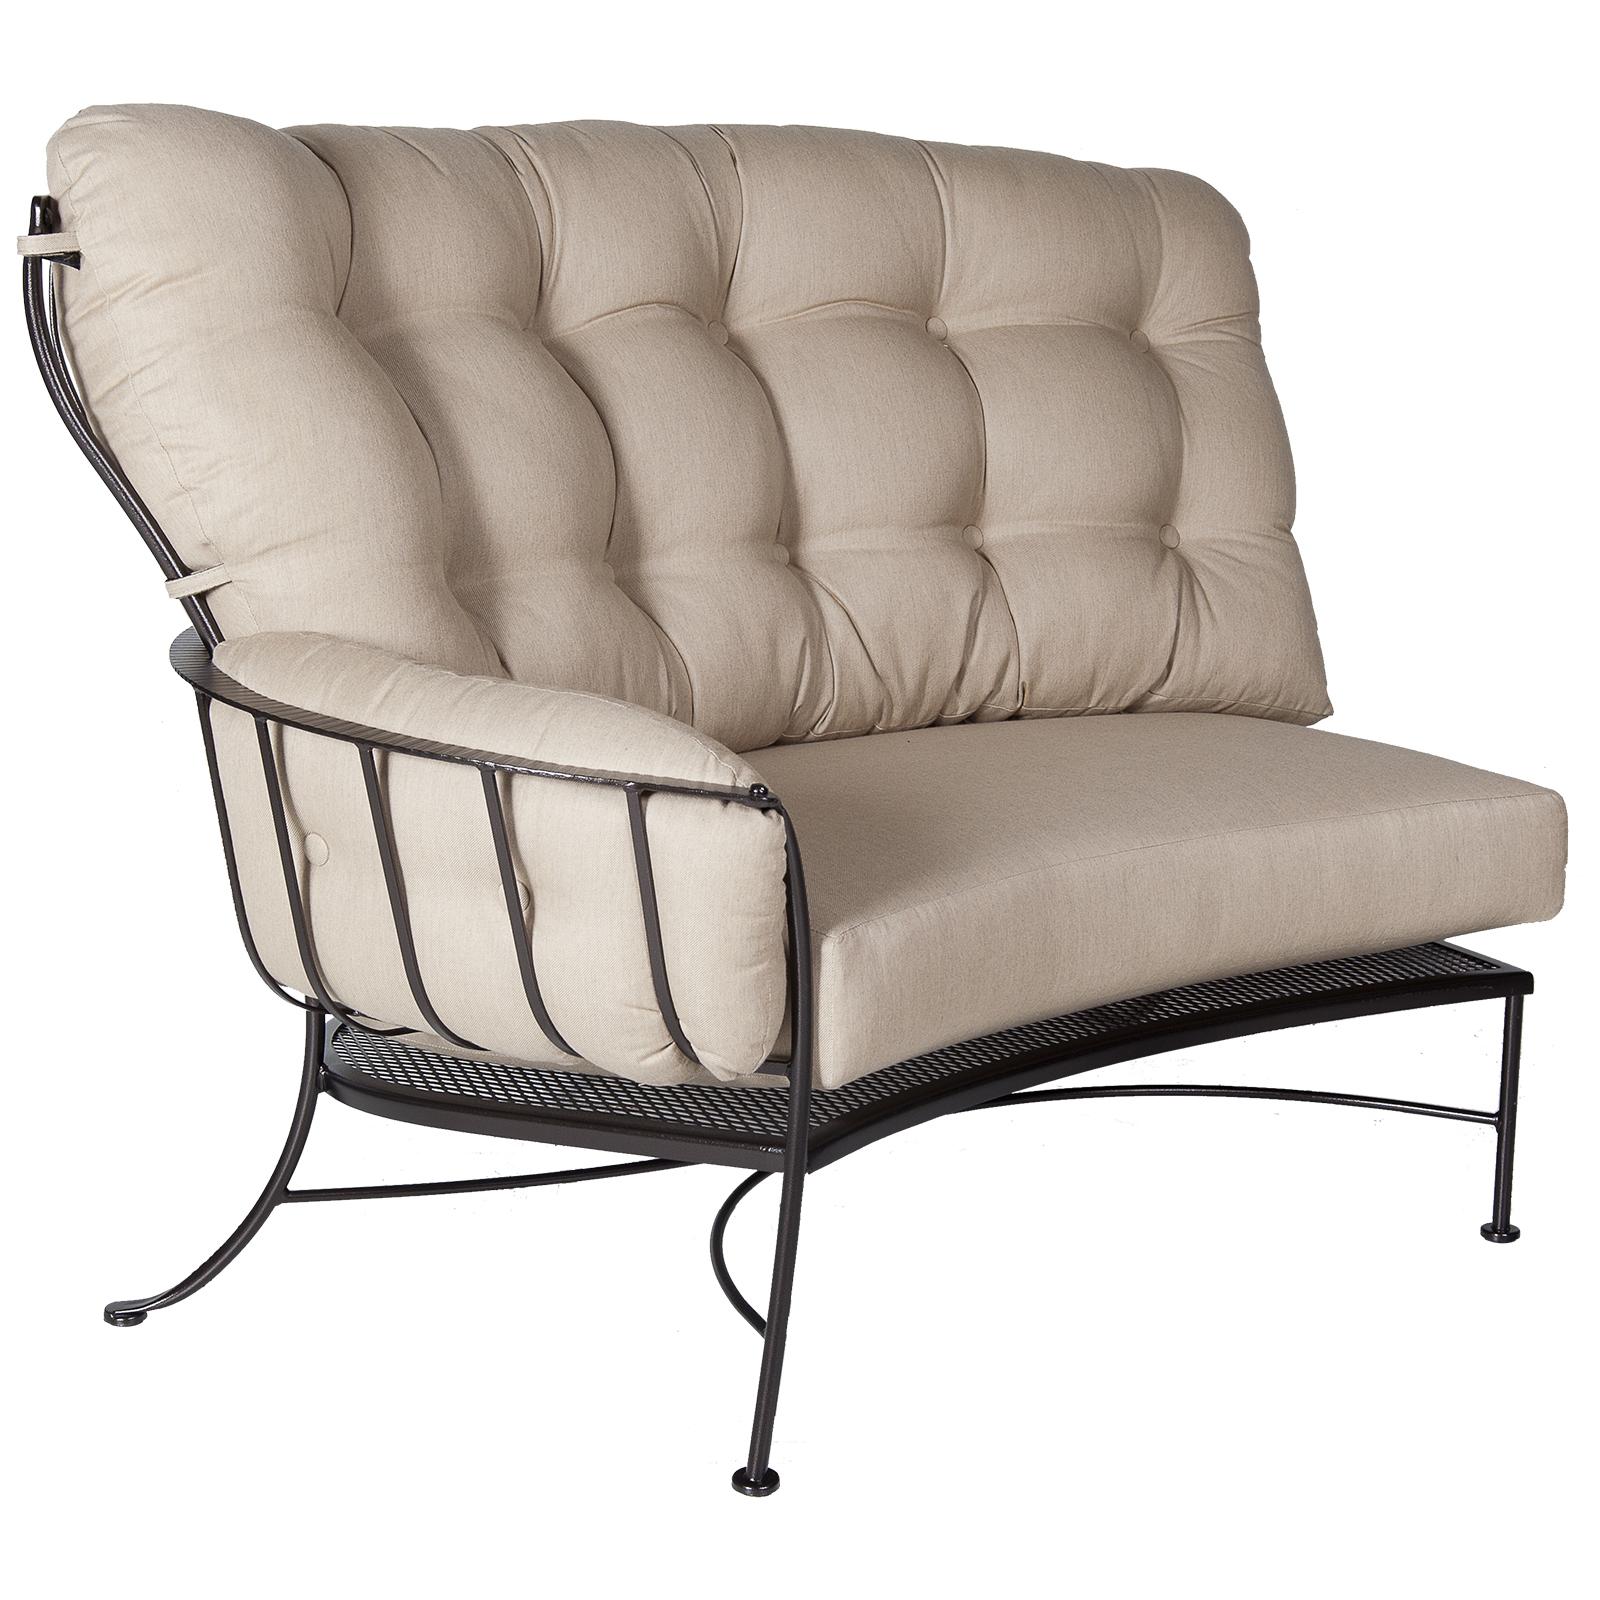 Monterra Cushion Right Section - Sailcloth Shadow